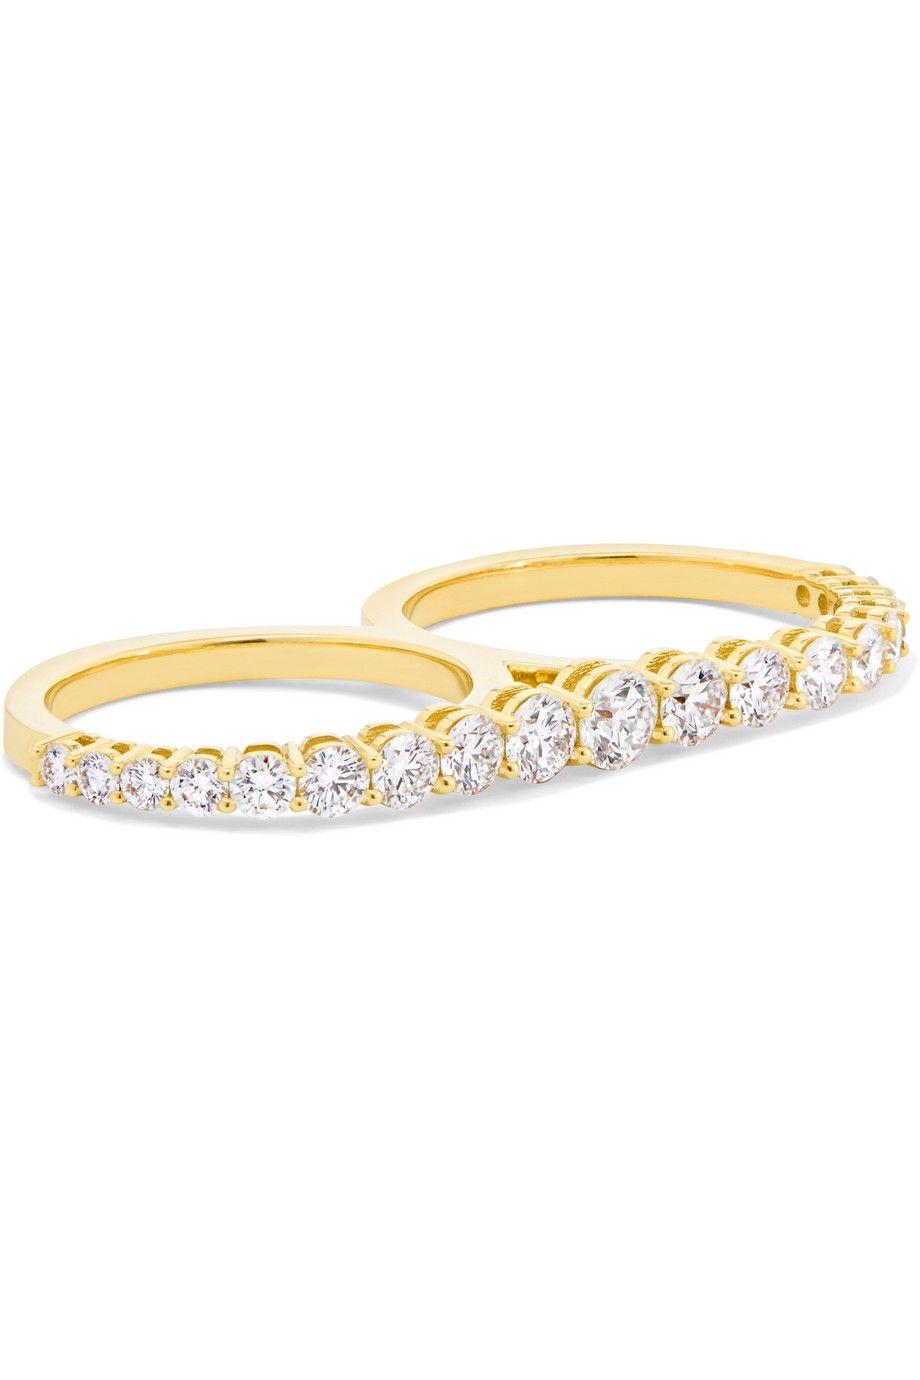 Aria 18 Carats Bague En Diamant D'or À Deux Doigts - 6 Melissa Kaye nC5a0xnfge